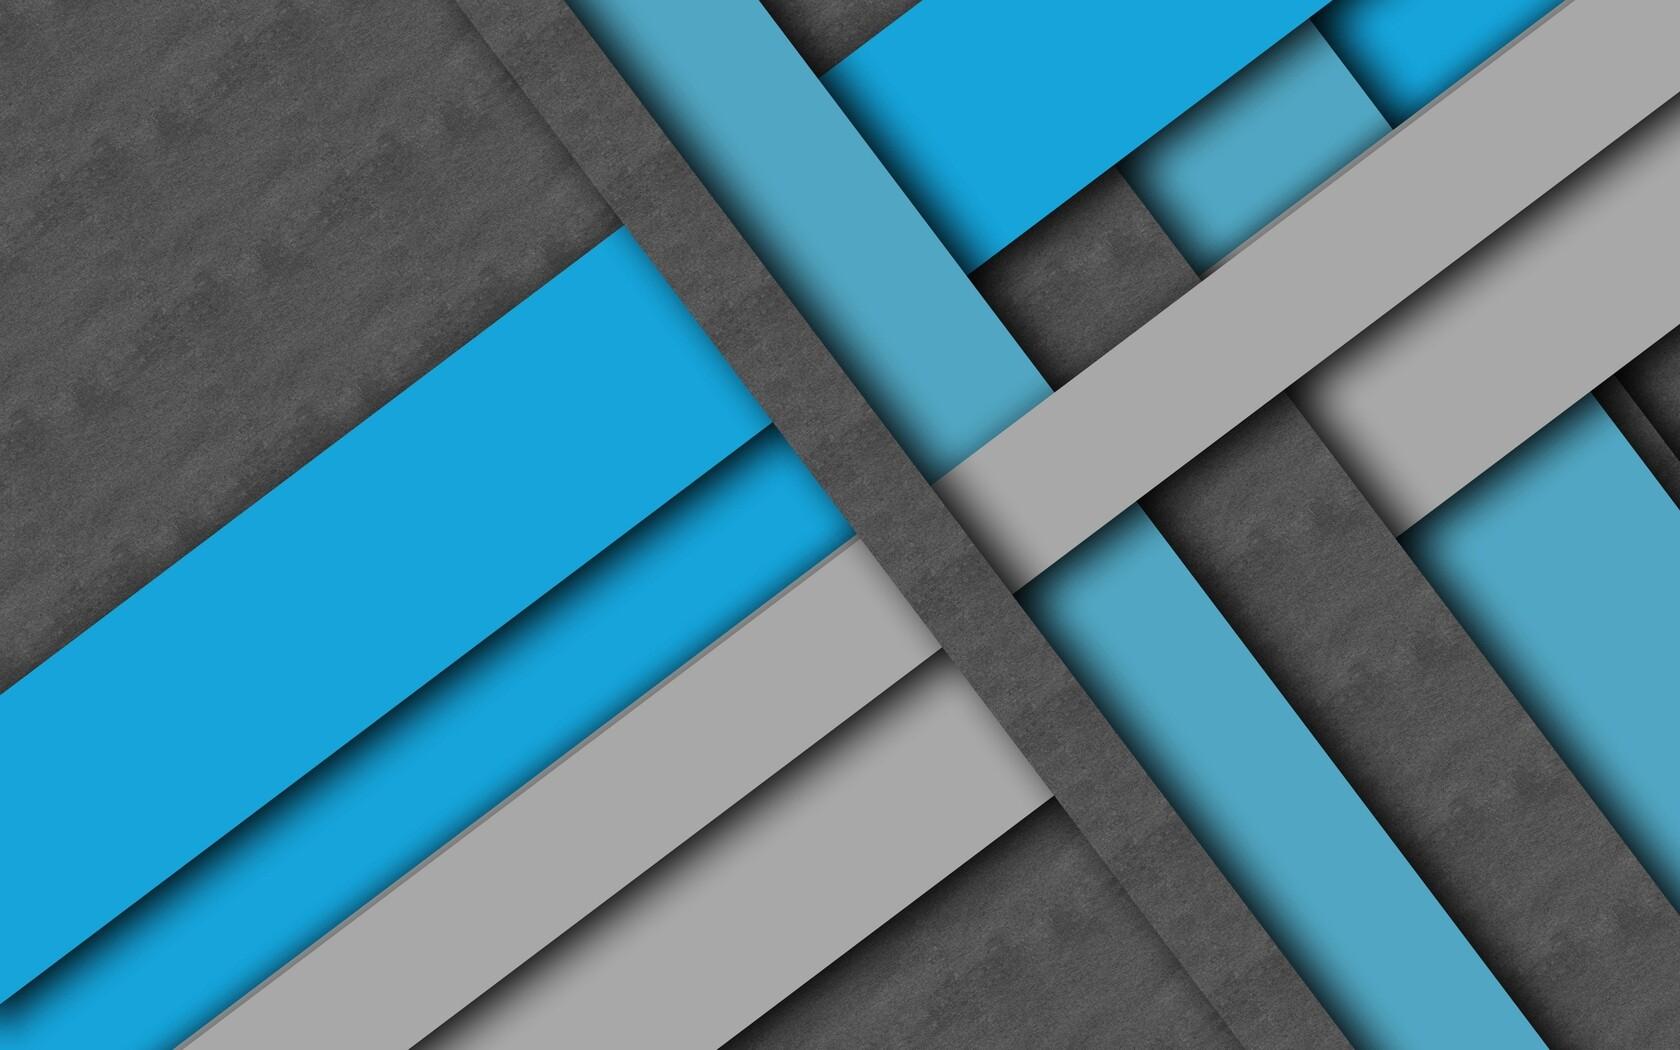 1680x1050 material design line texture hd 1680x1050 resolution hd 4kmaterial design line texture hd new jpg